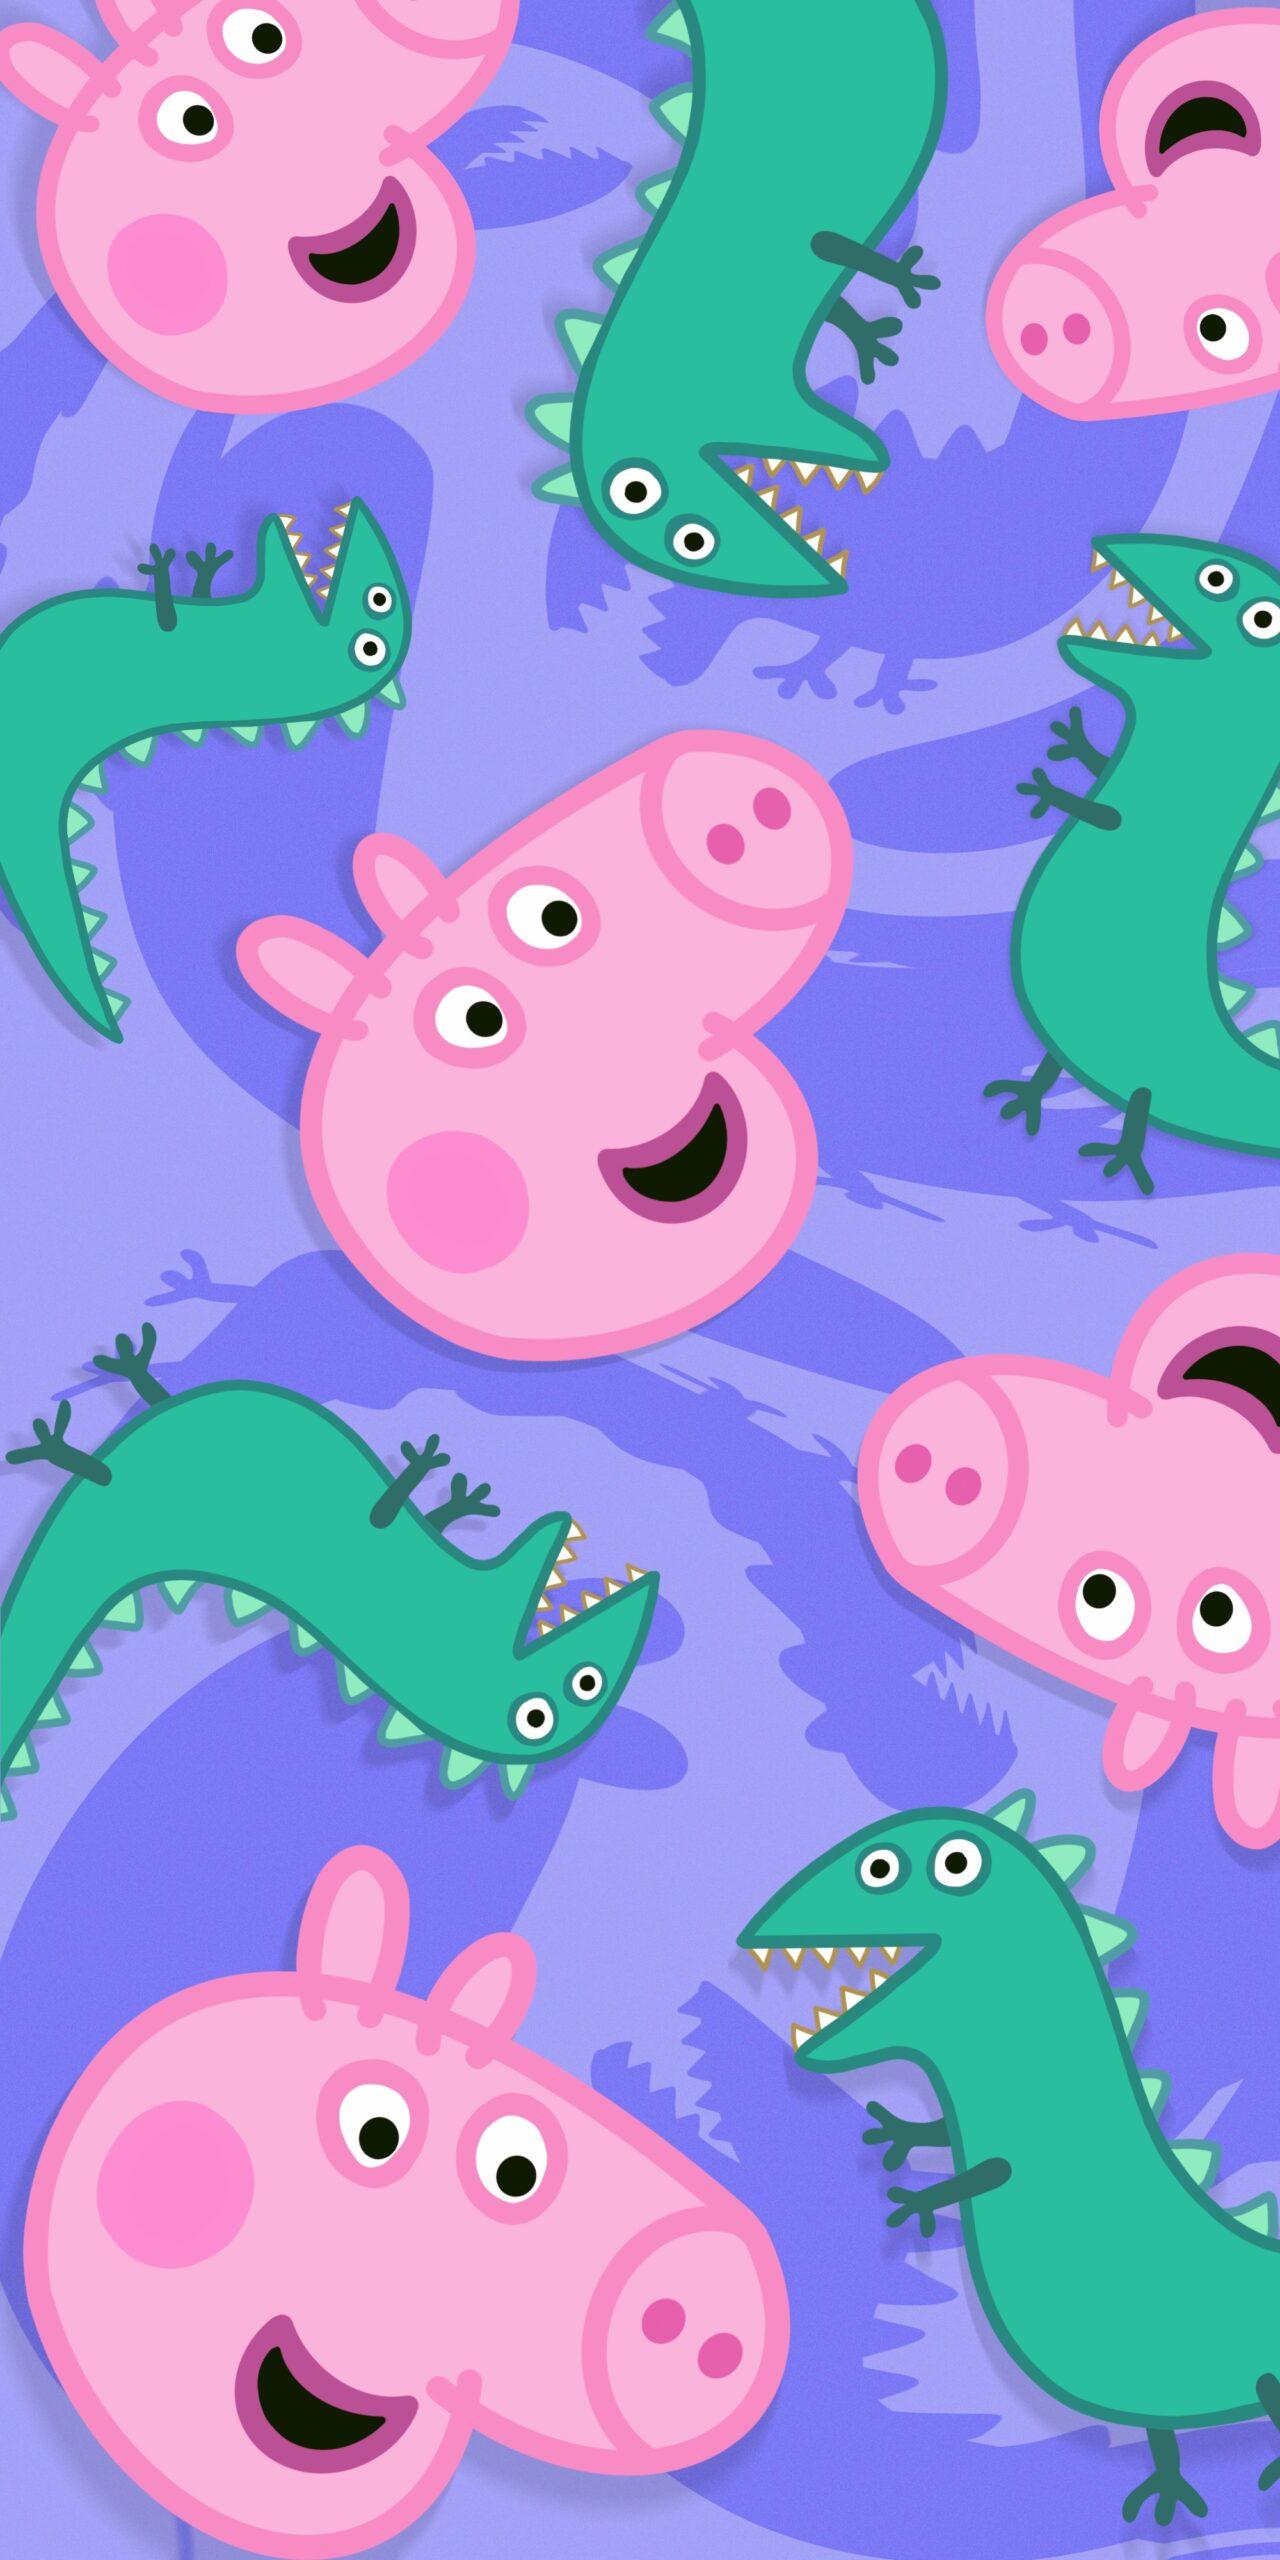 peppa pig george dinosaur purple wallpaper